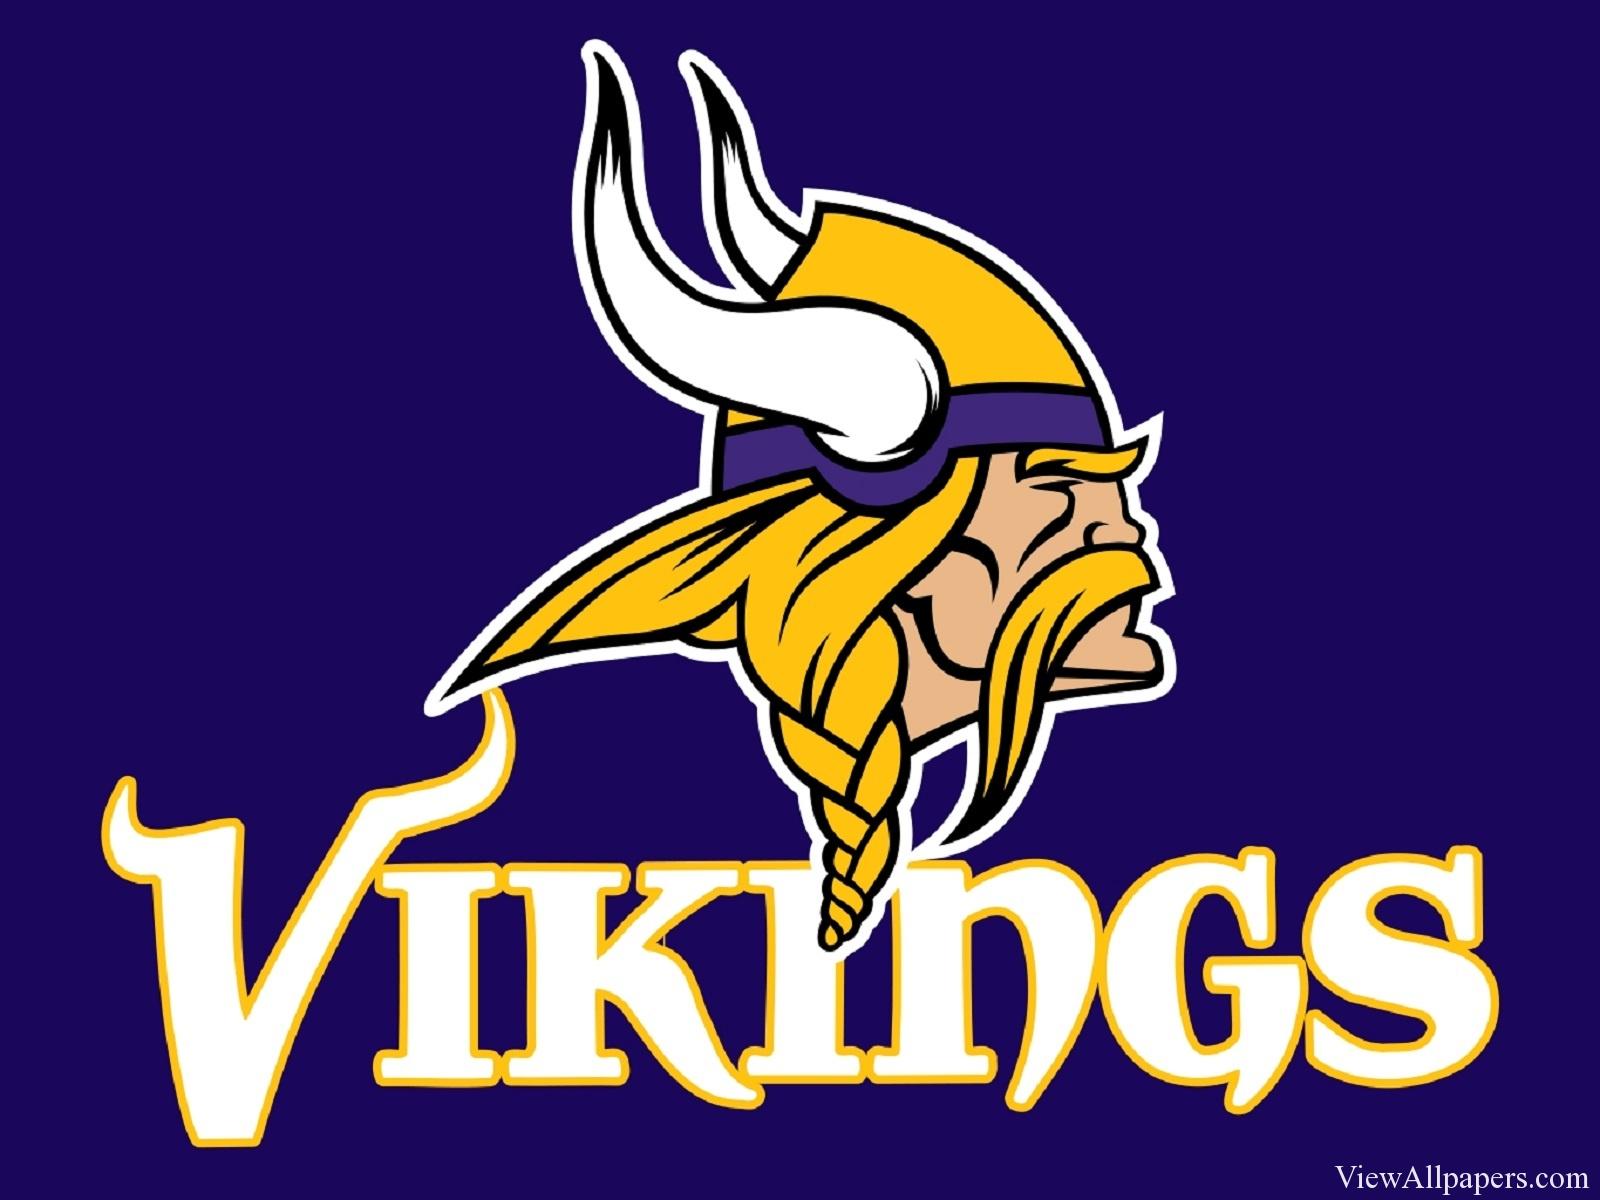 Vikings Logo HD Resolution Wallpaper download Minnesota Vikings 1600x1200